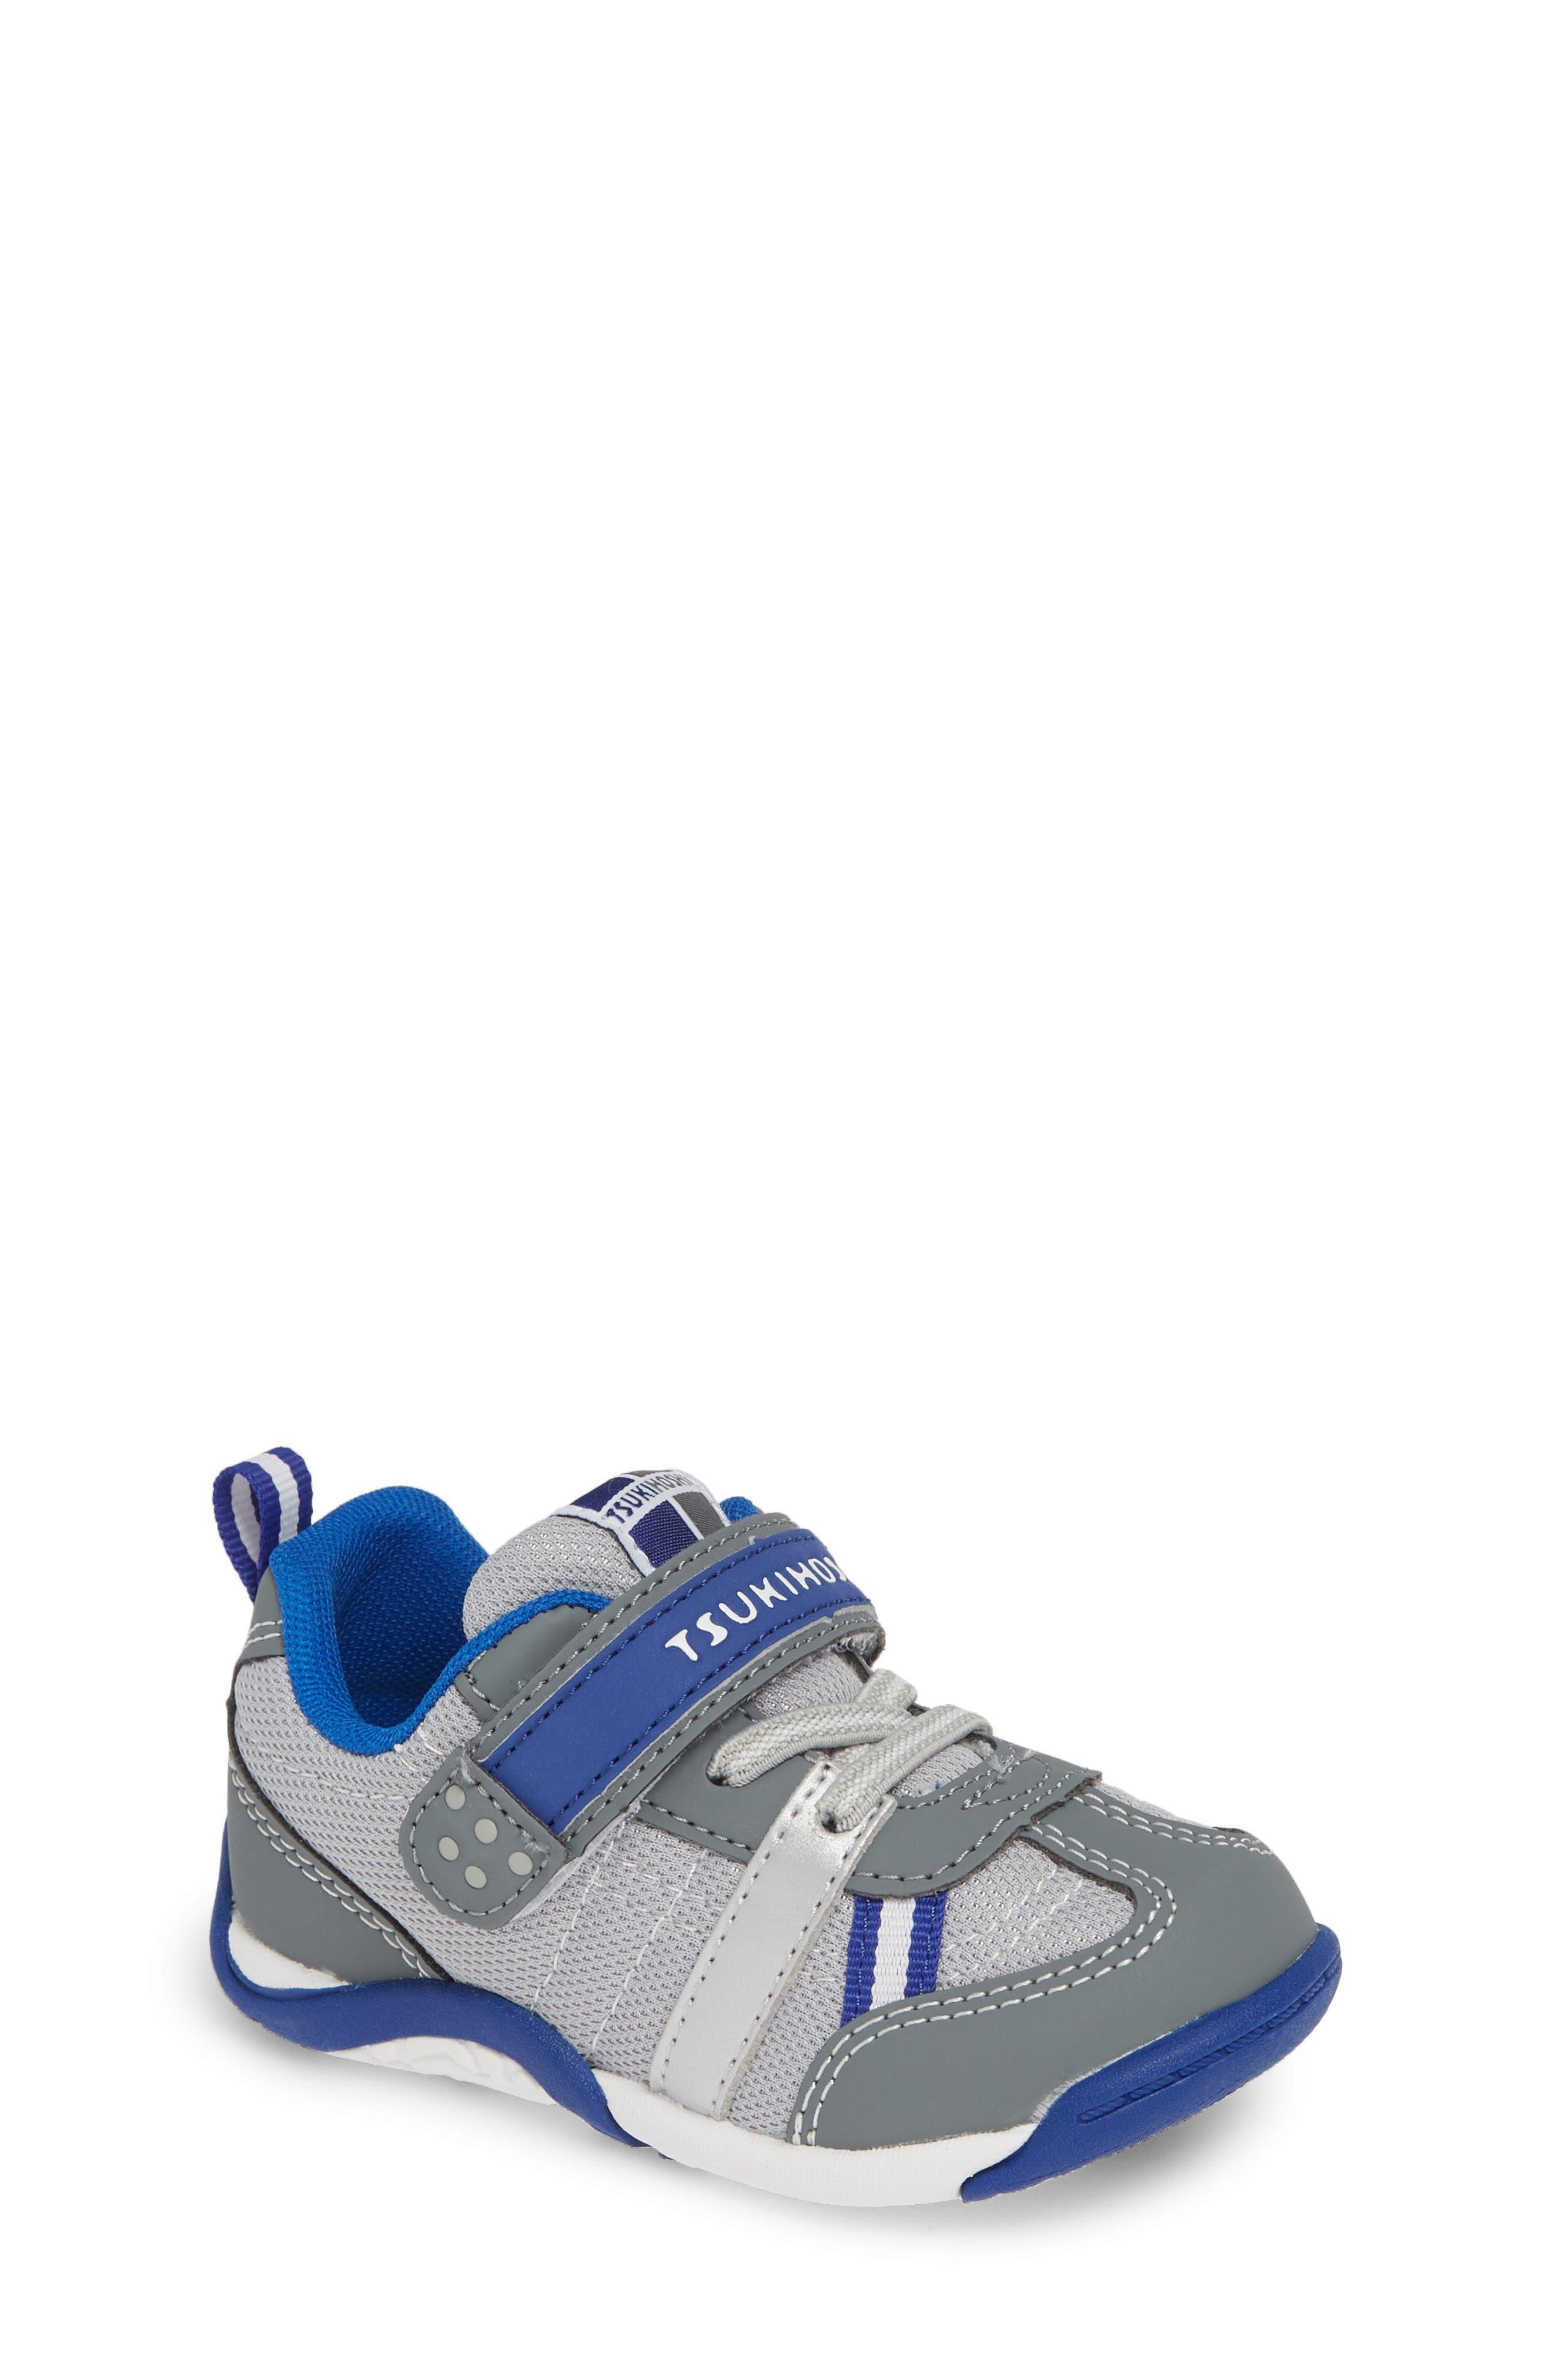 TSUKIHOSHI Kaz Washable Sneaker, Main, color, GRAY/ ROYAL